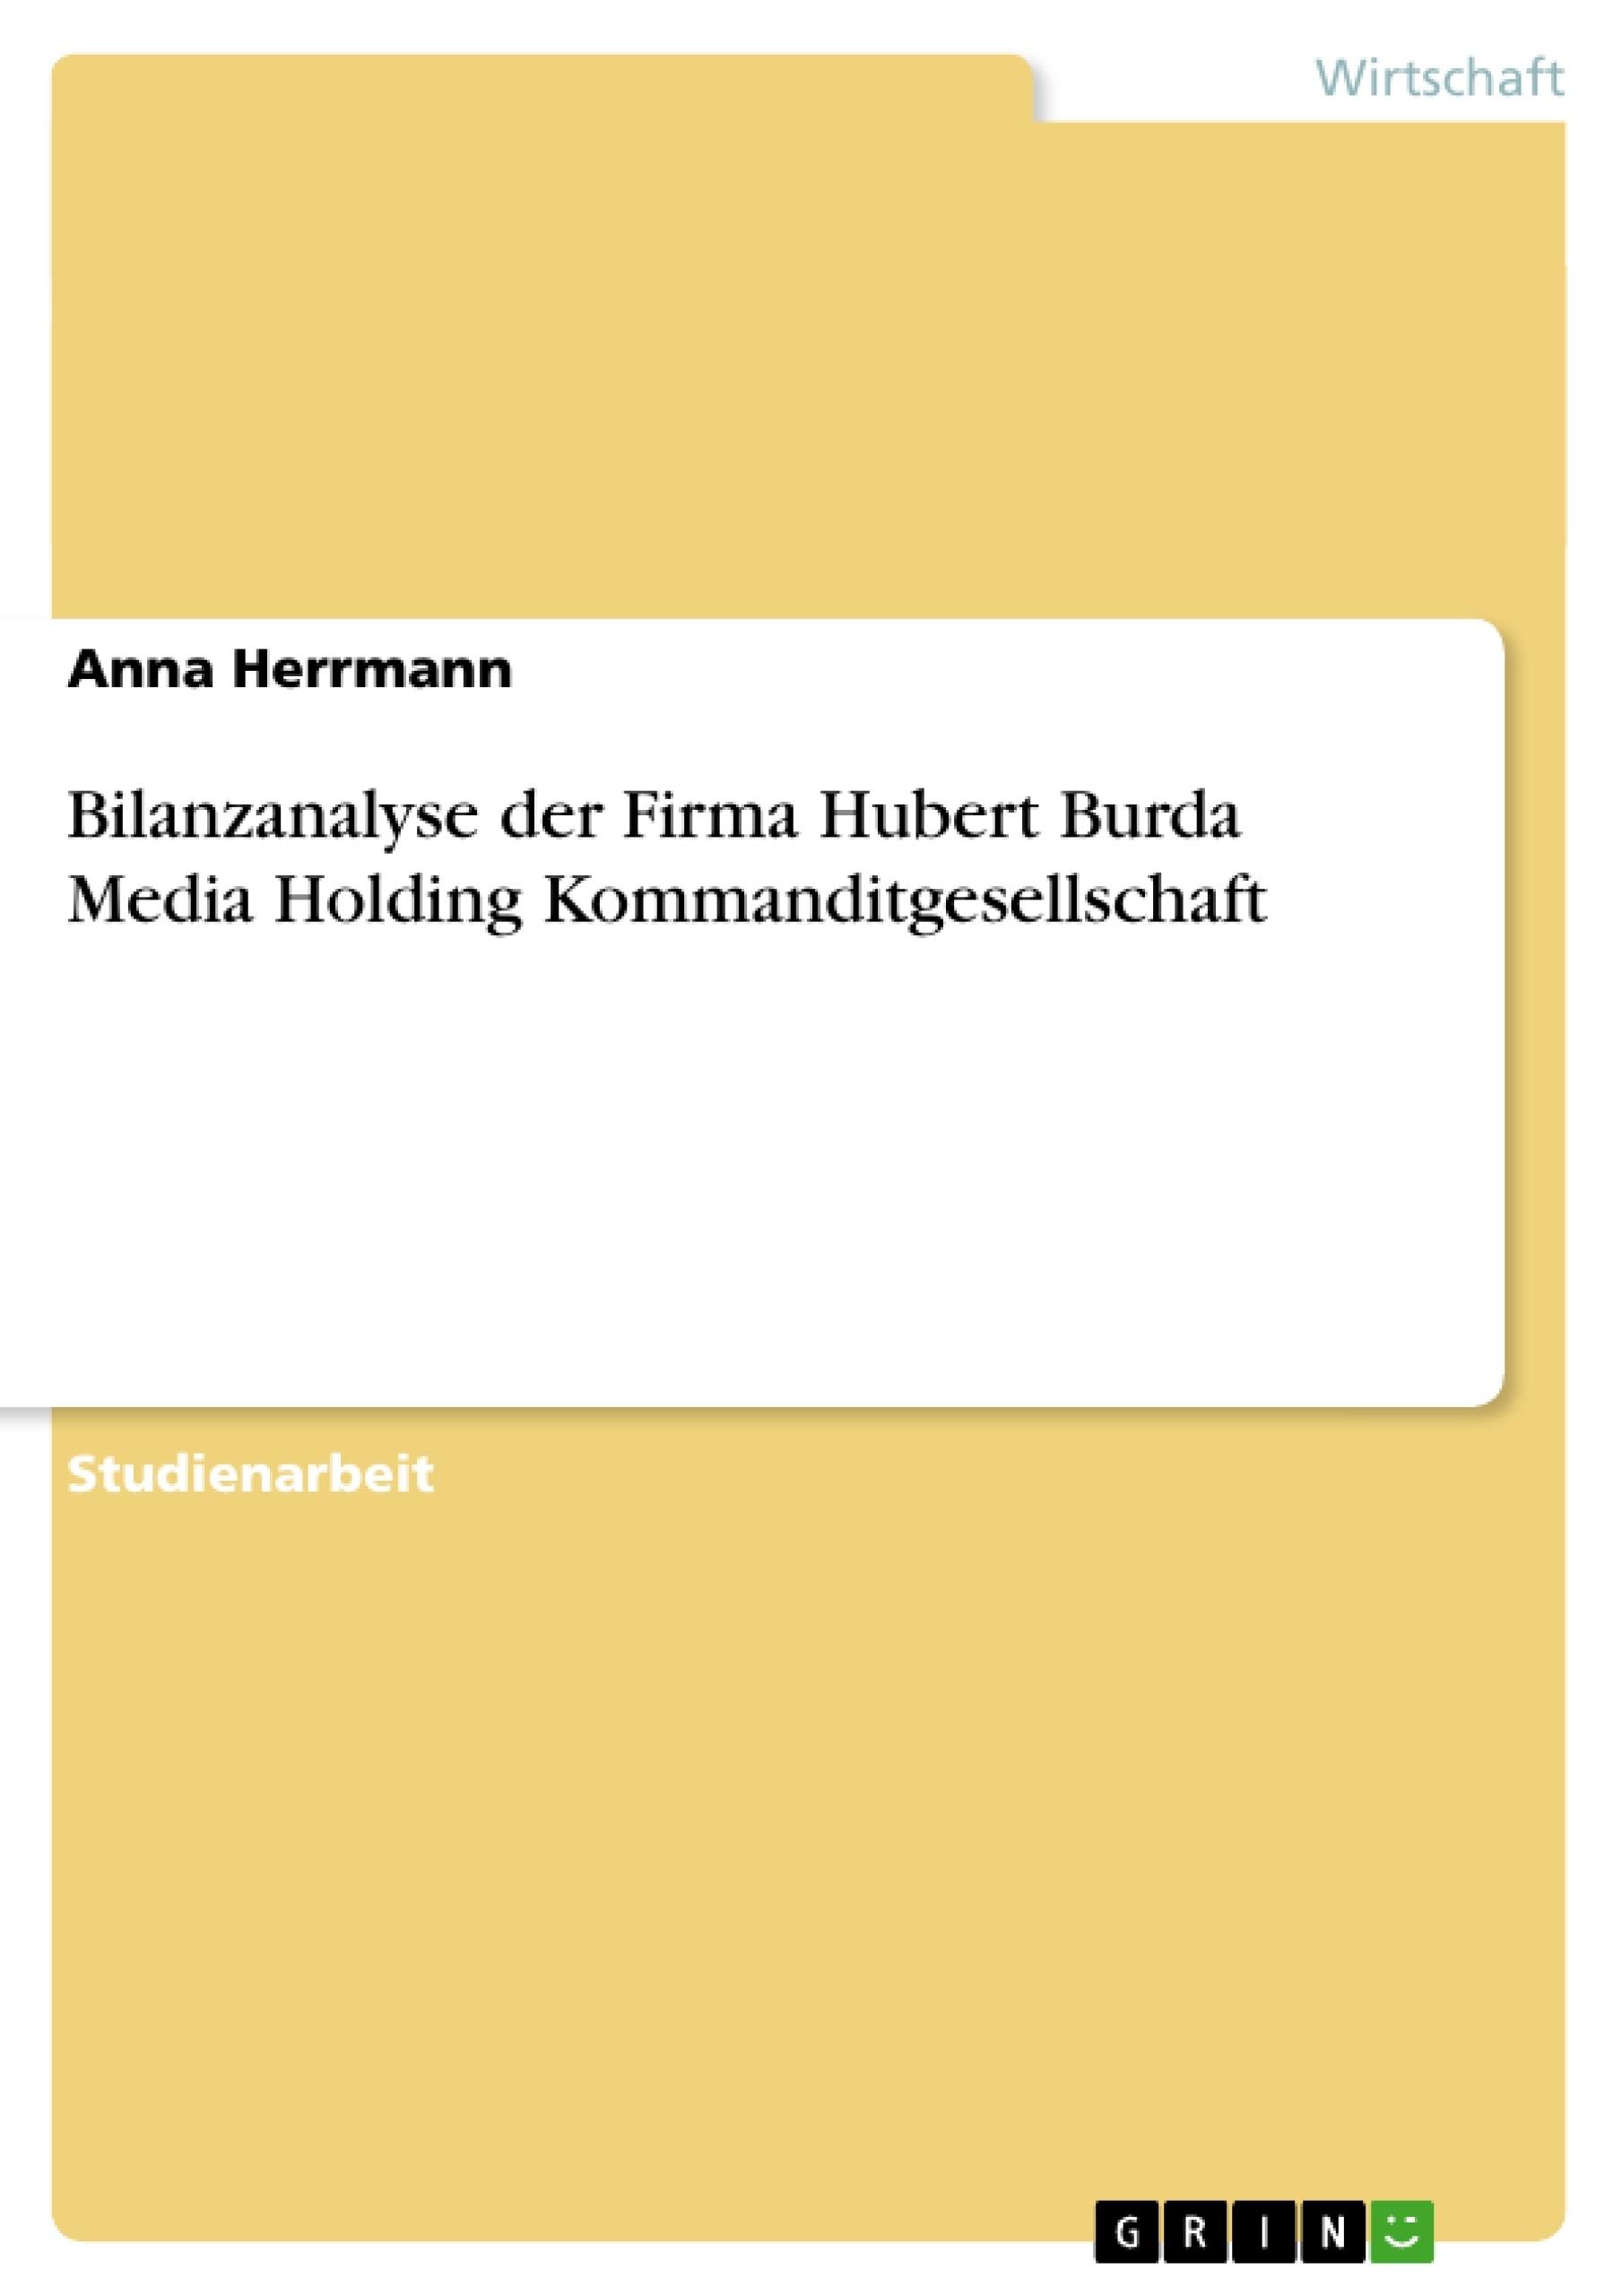 Titel: Bilanzanalyse der Firma Hubert Burda Media Holding Kommanditgesellschaft